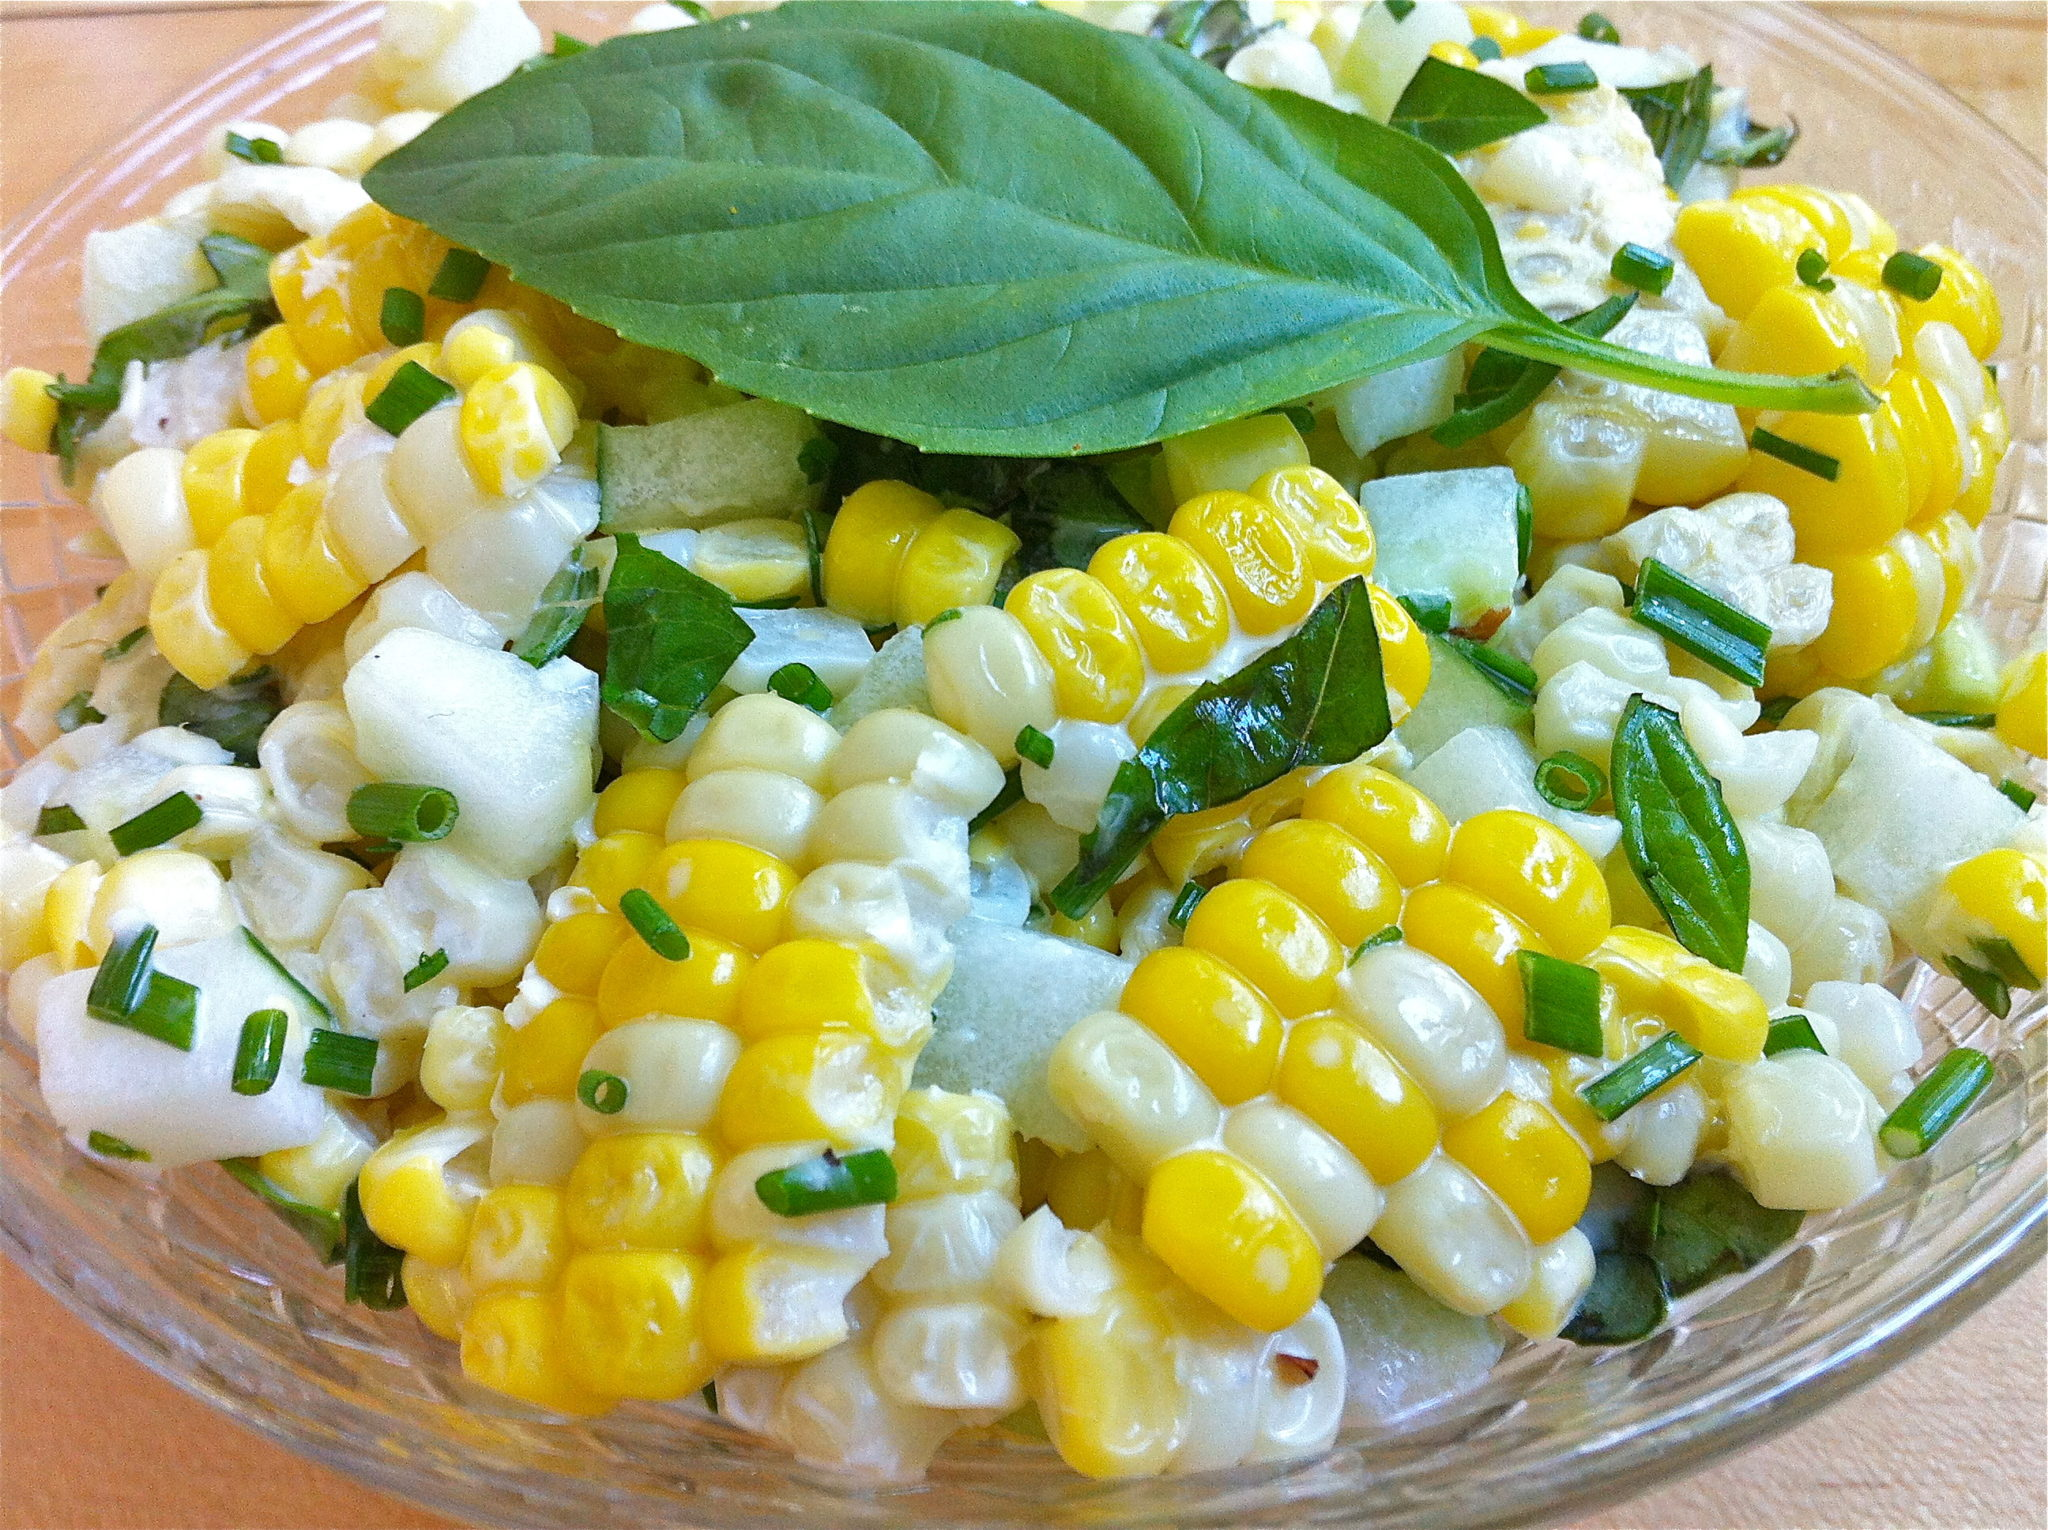 Corn On The Cob Recipe The Kitchen Sunny